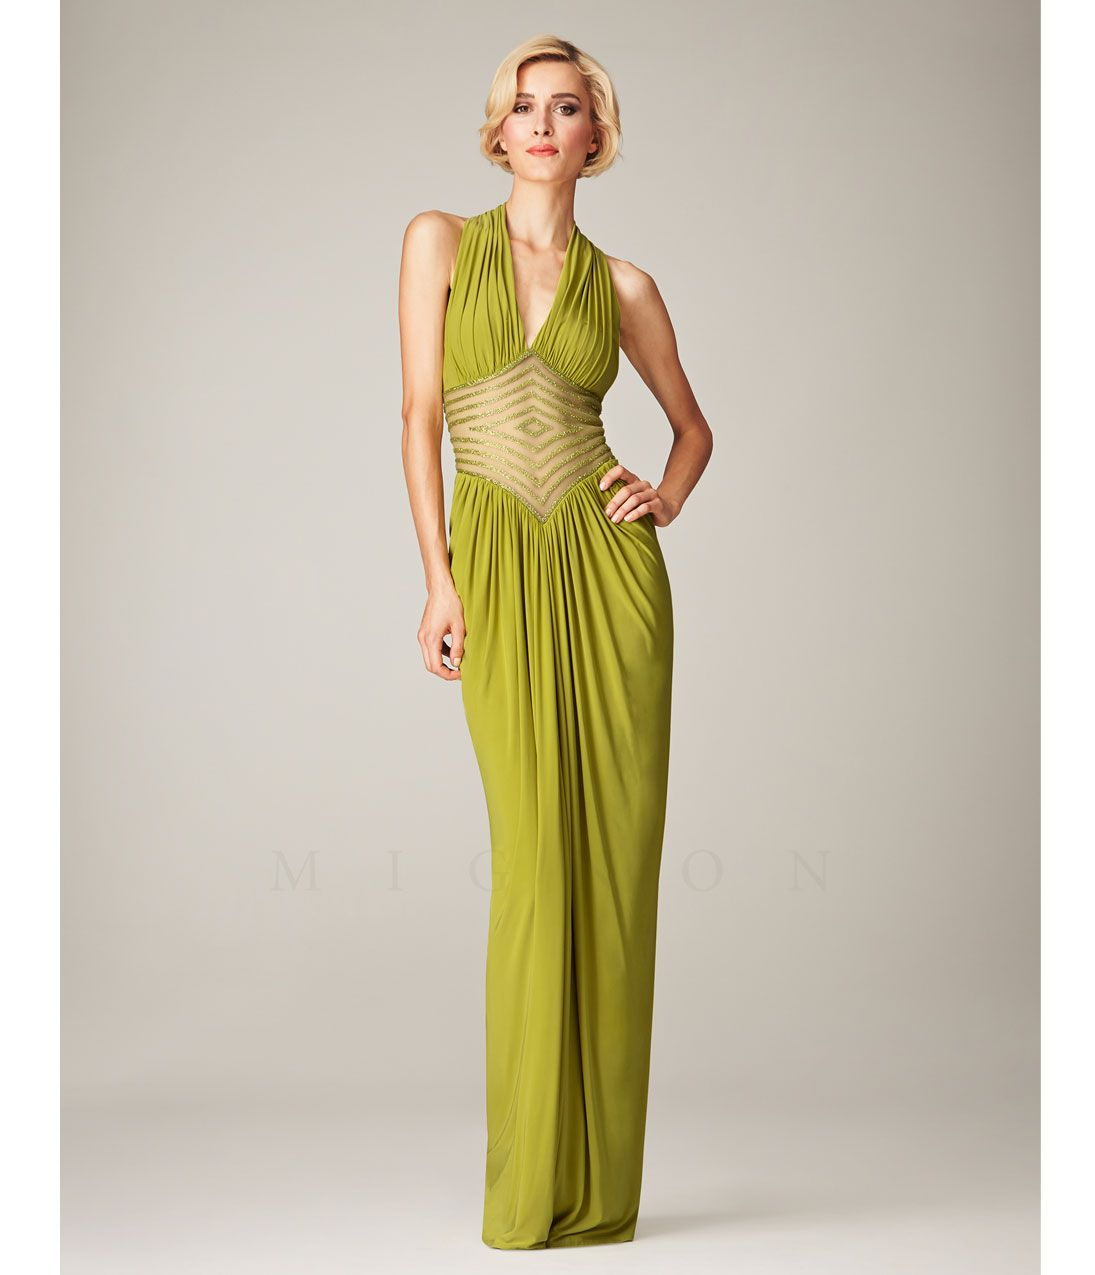 Van more evening dresses